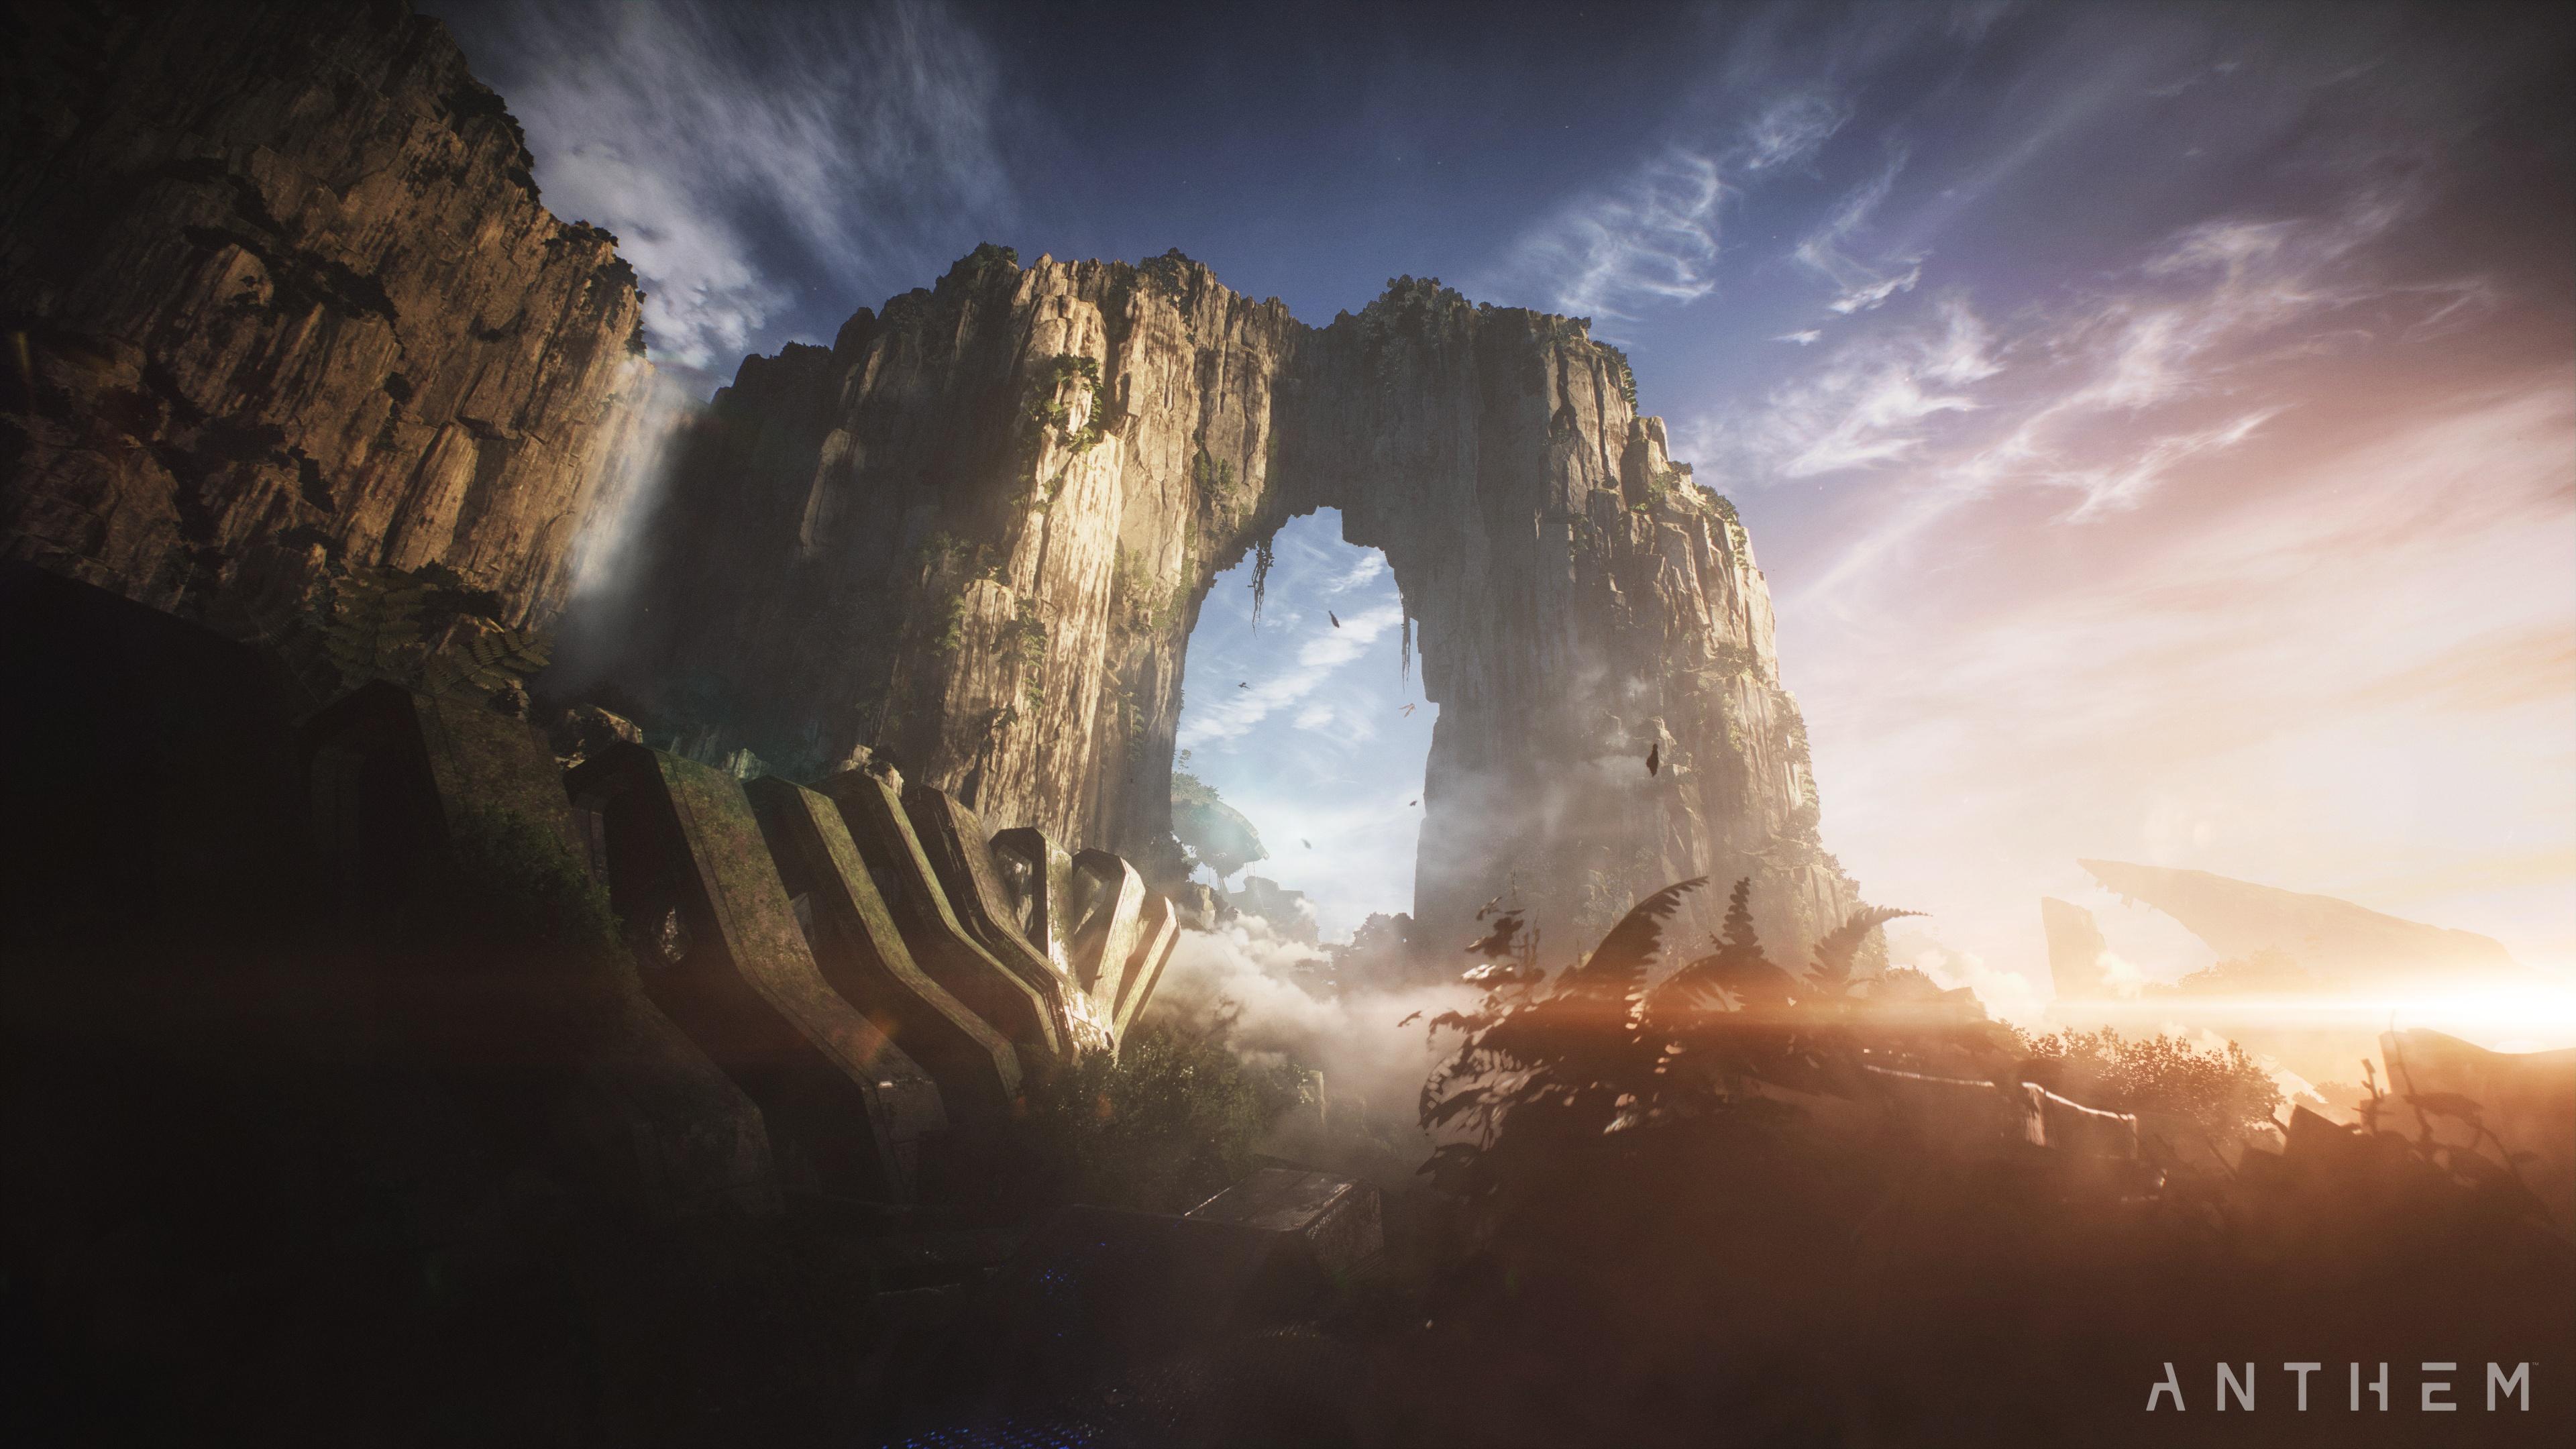 Anthem 4k Ultra Fond d'écran HD | Arrière-Plan | 3840x2160 | ID:926622 - Wallpaper Abyss